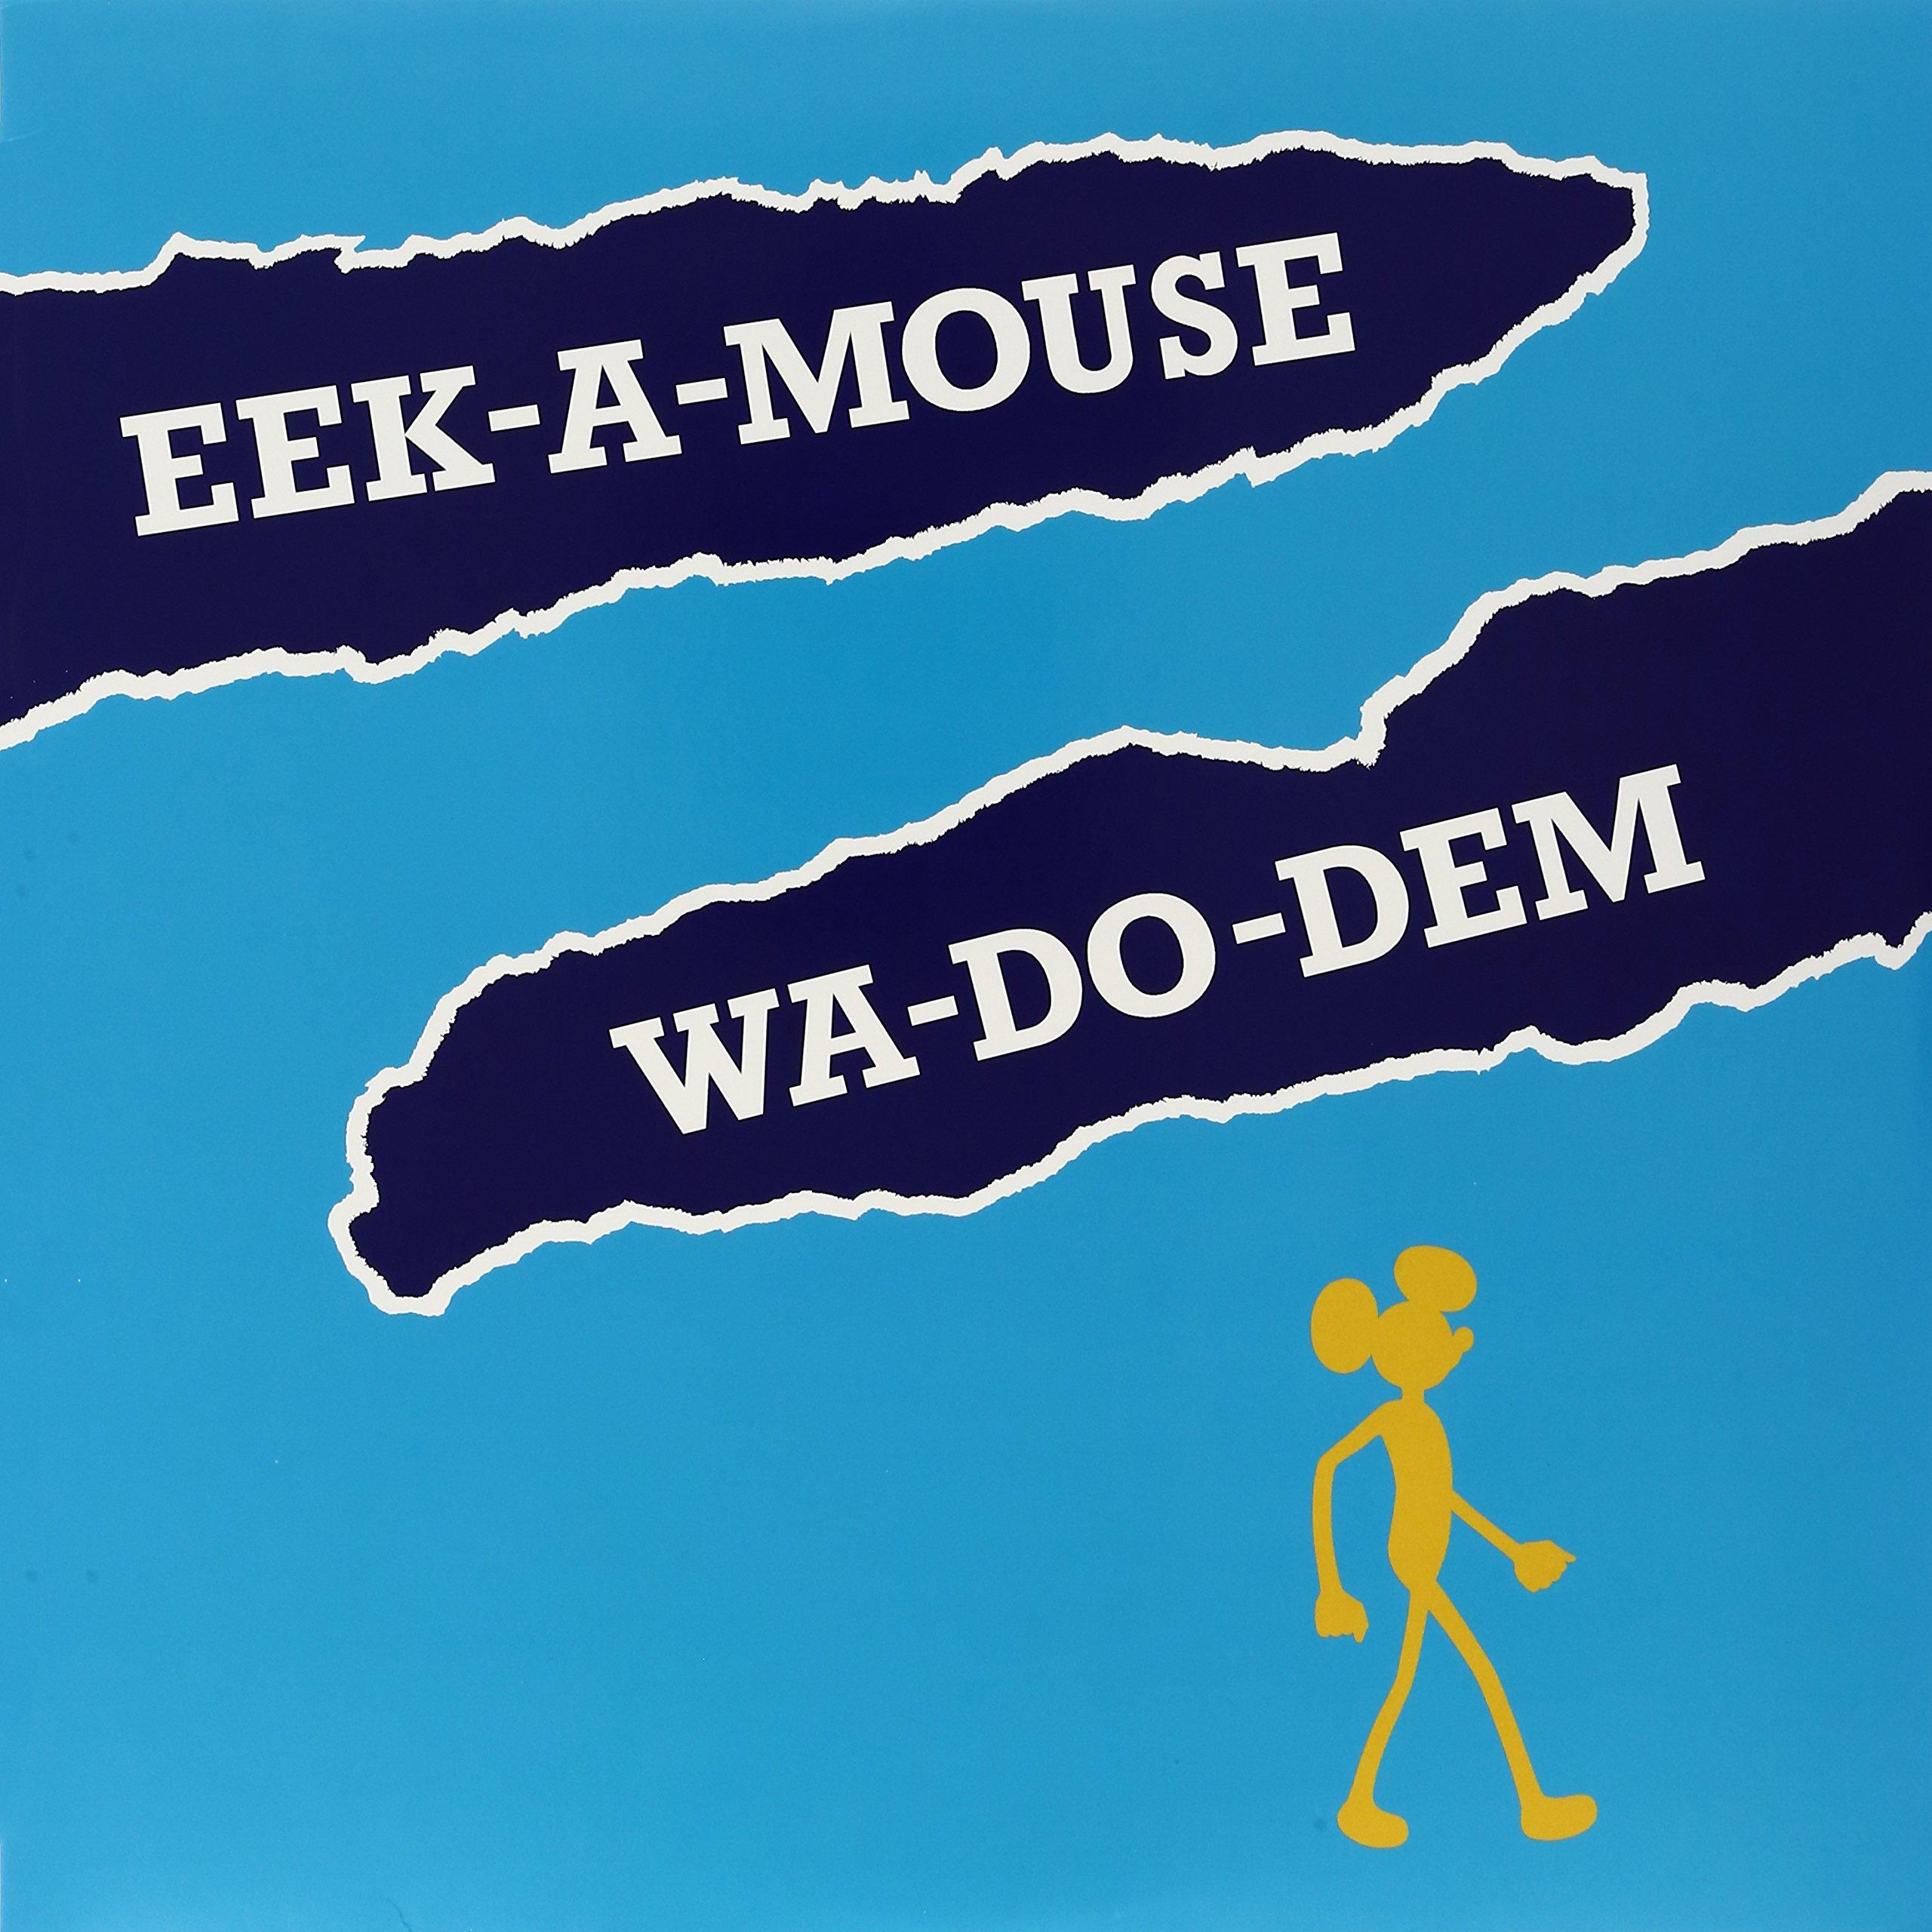 Wah - Do - Dem